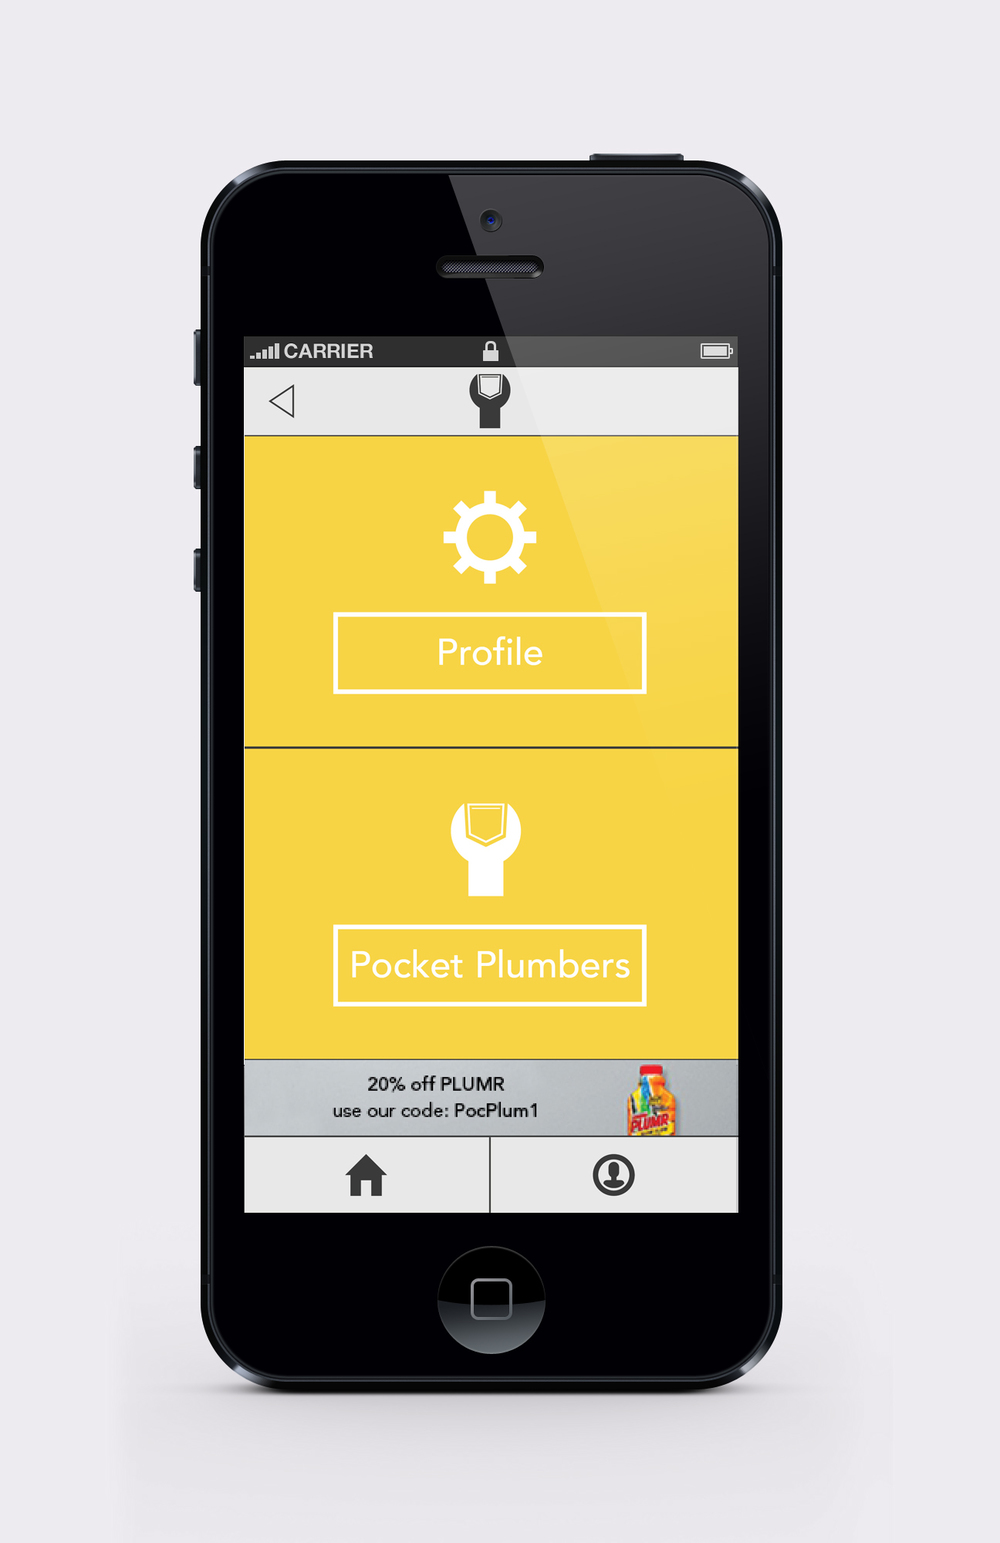 Pocket Plumber customer settings screen